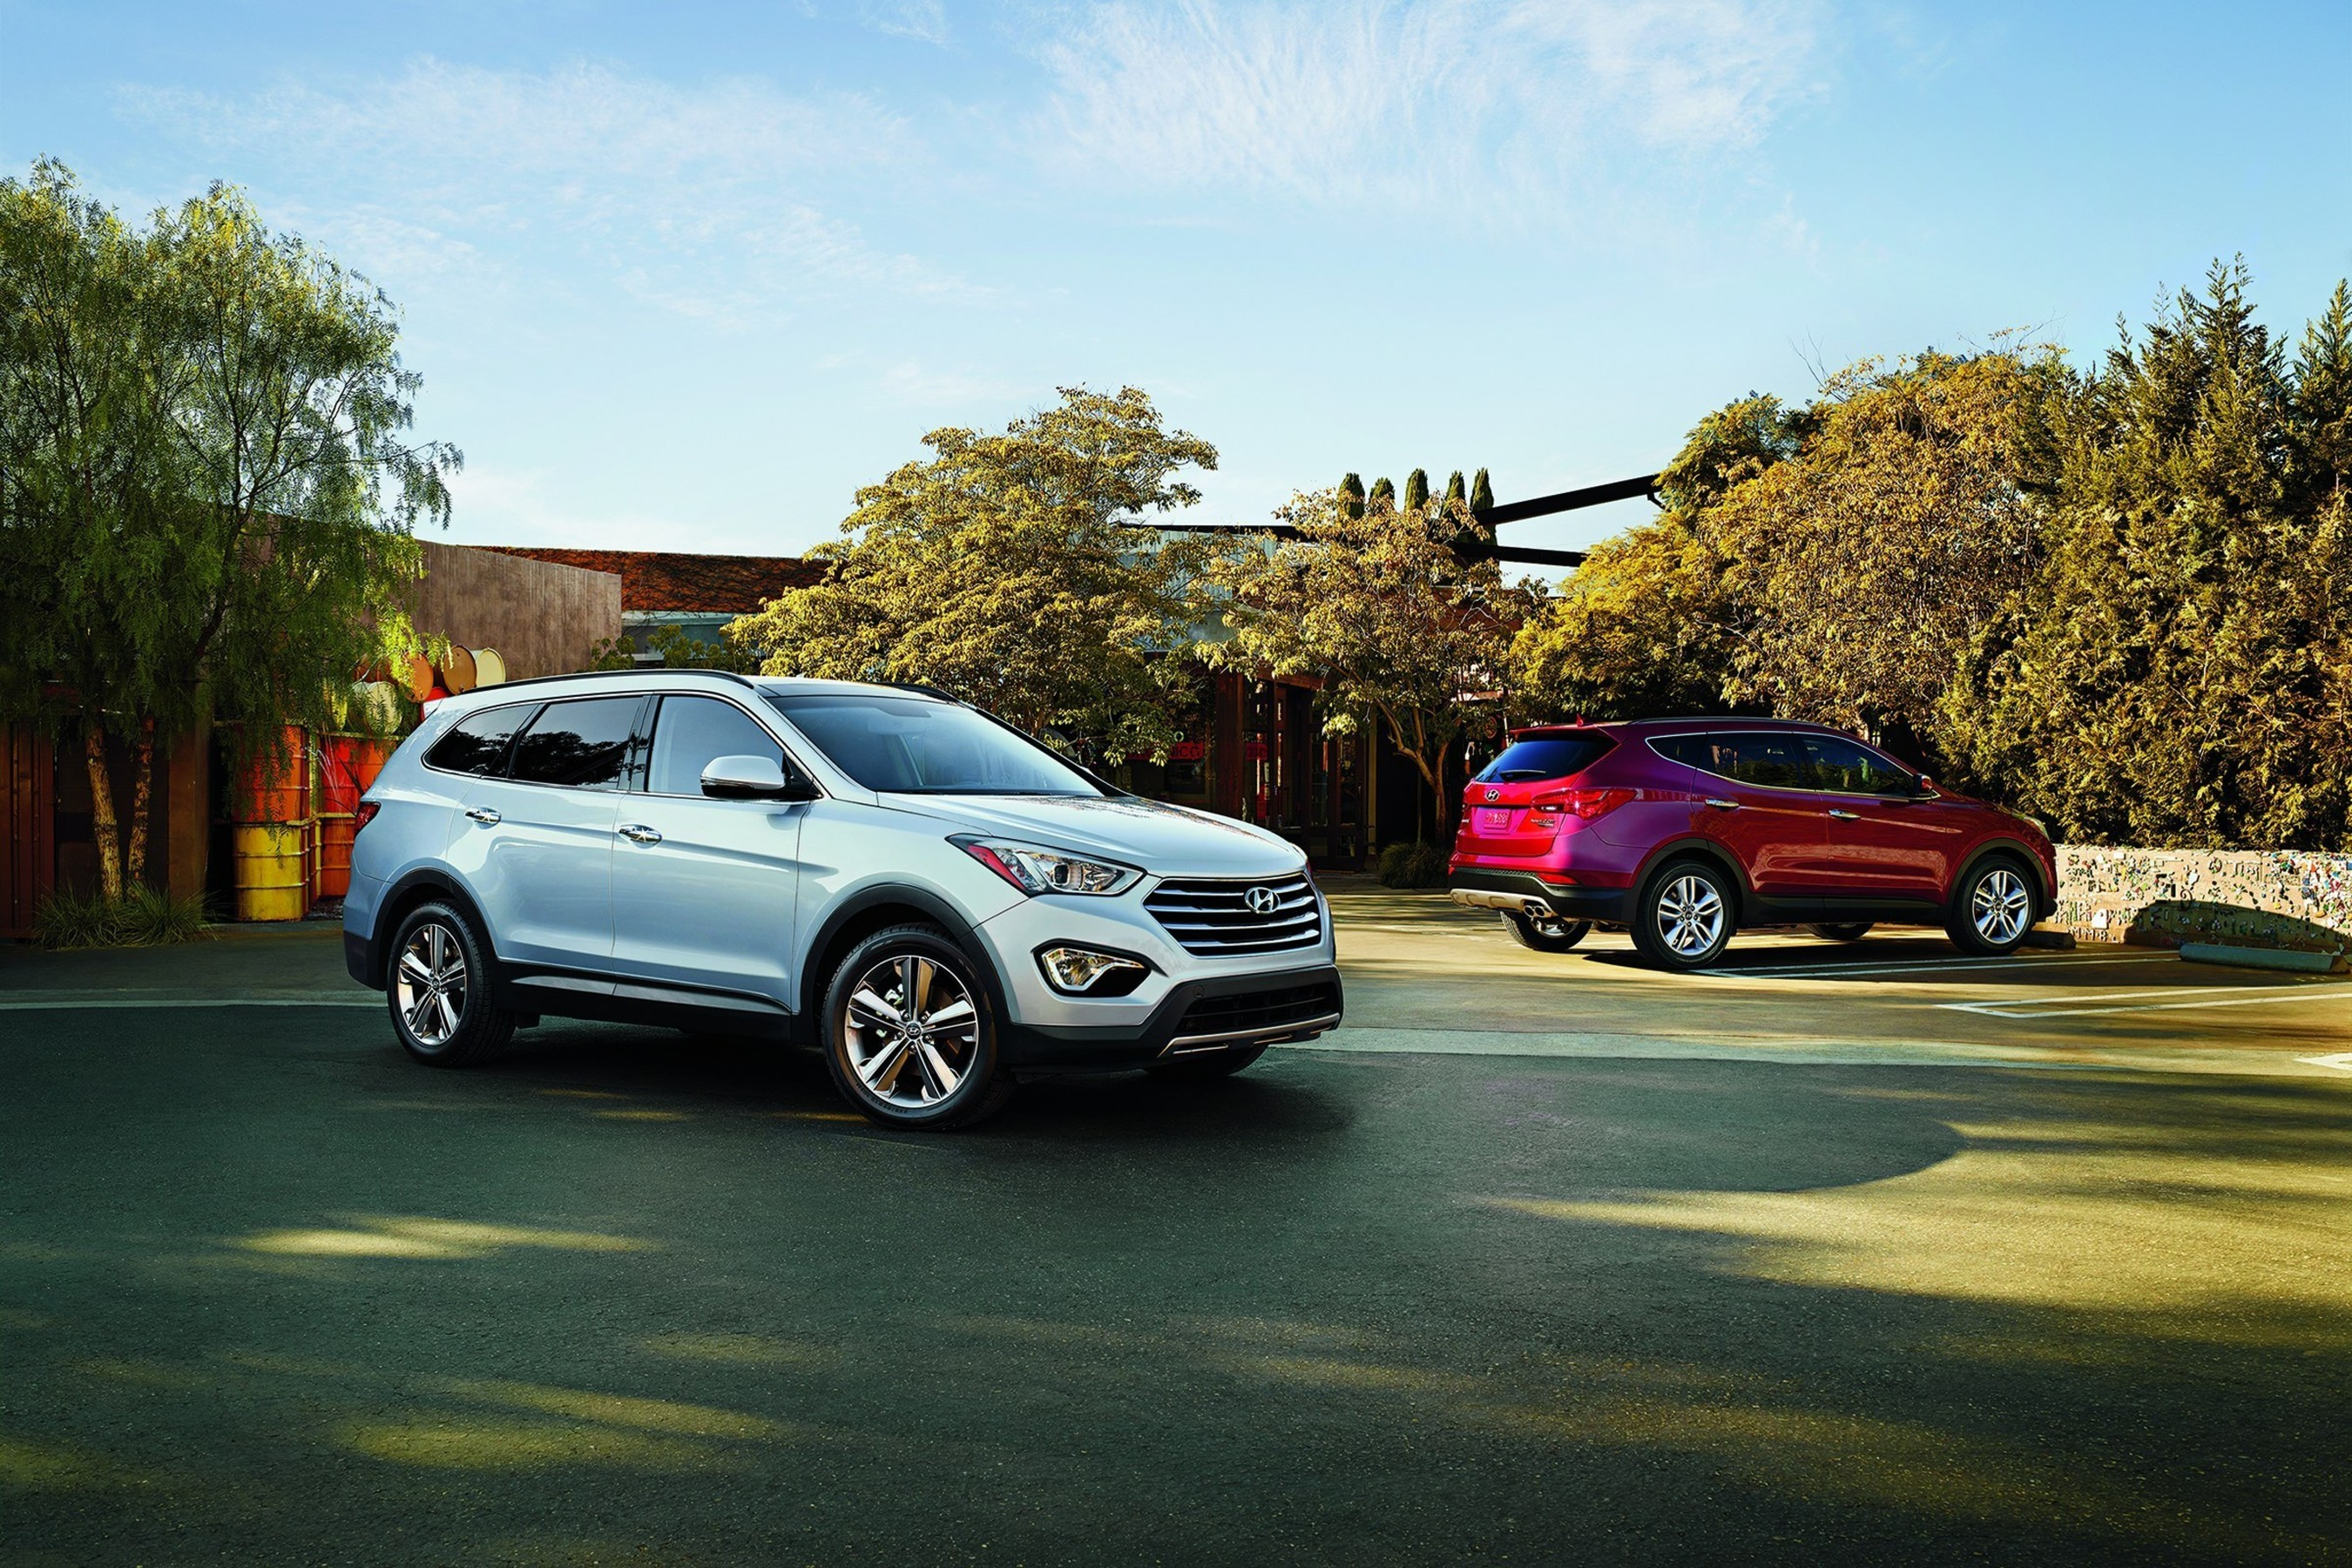 santa auto hyundai sales leader listings full sport fe img